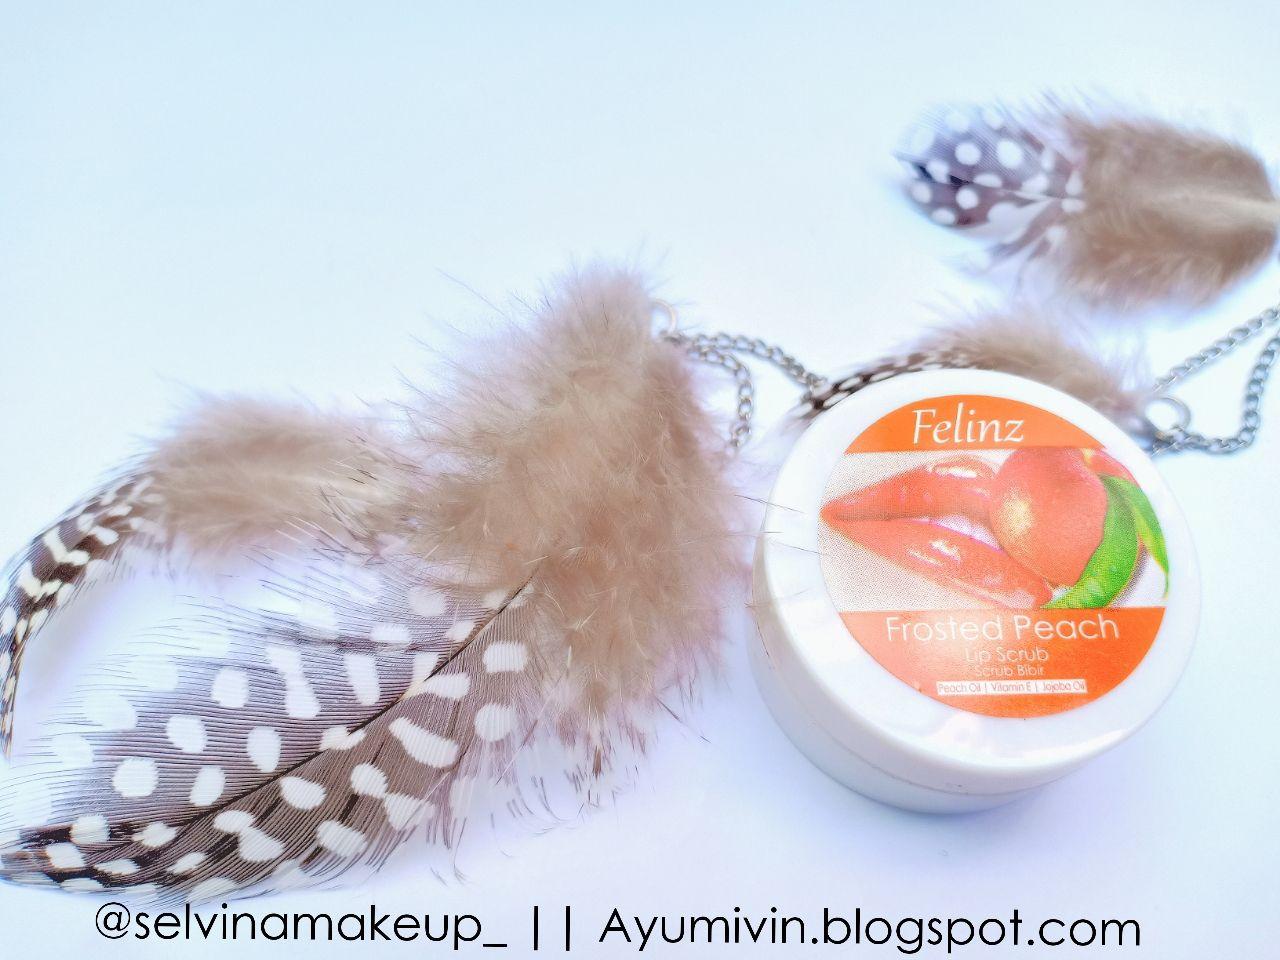 gambar review ke-8 untuk Felinz Lip Scrub Frosted Peach